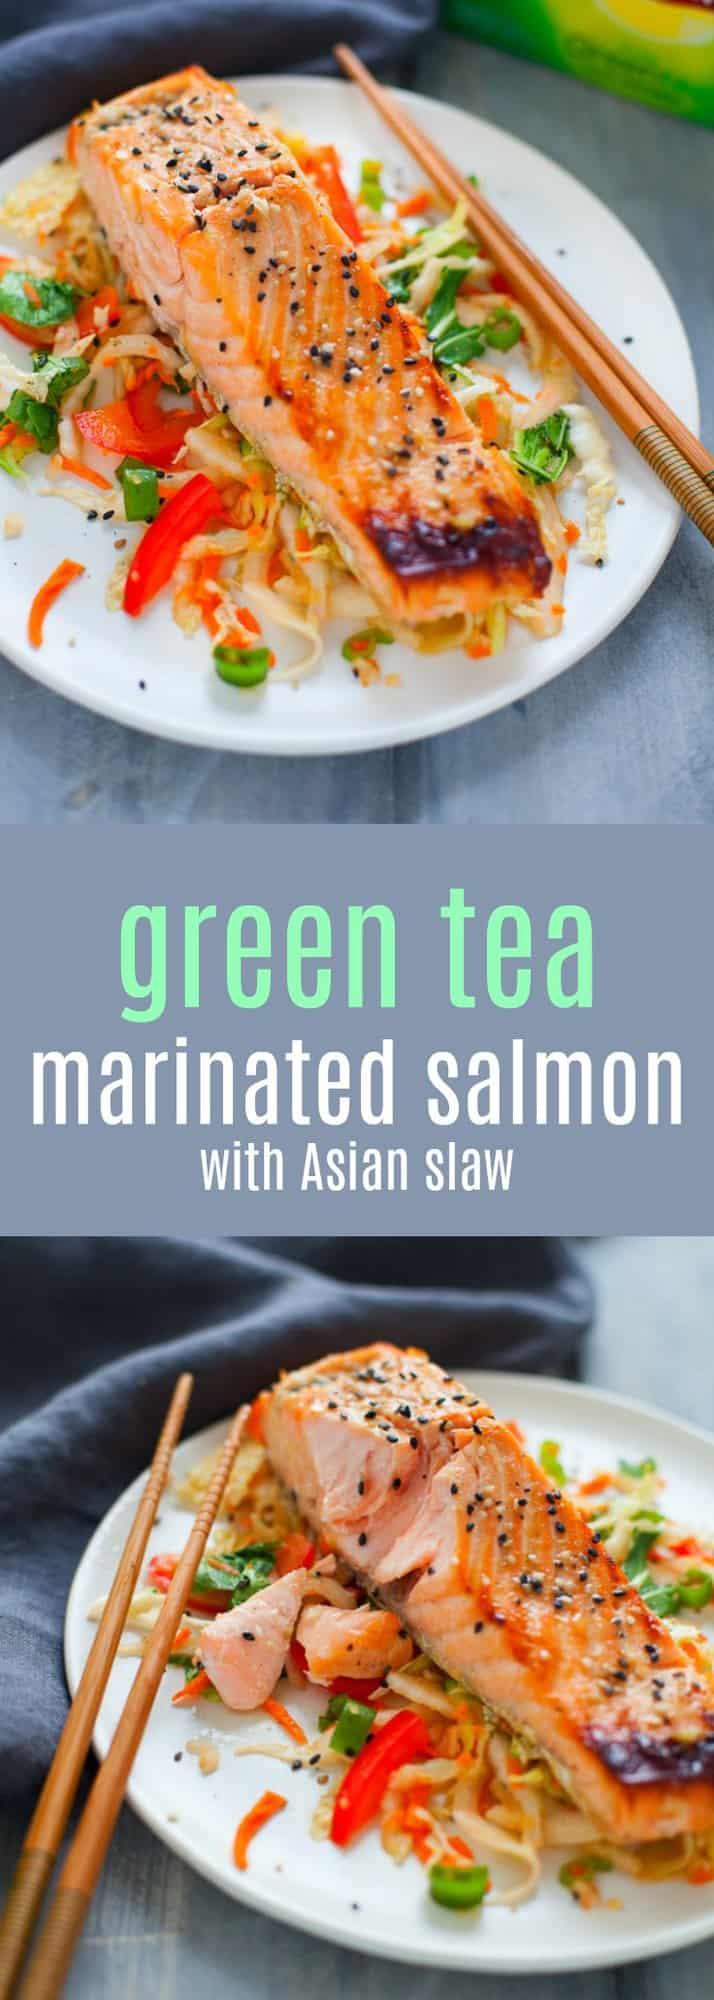 How to Make TeaMarinated Salmon